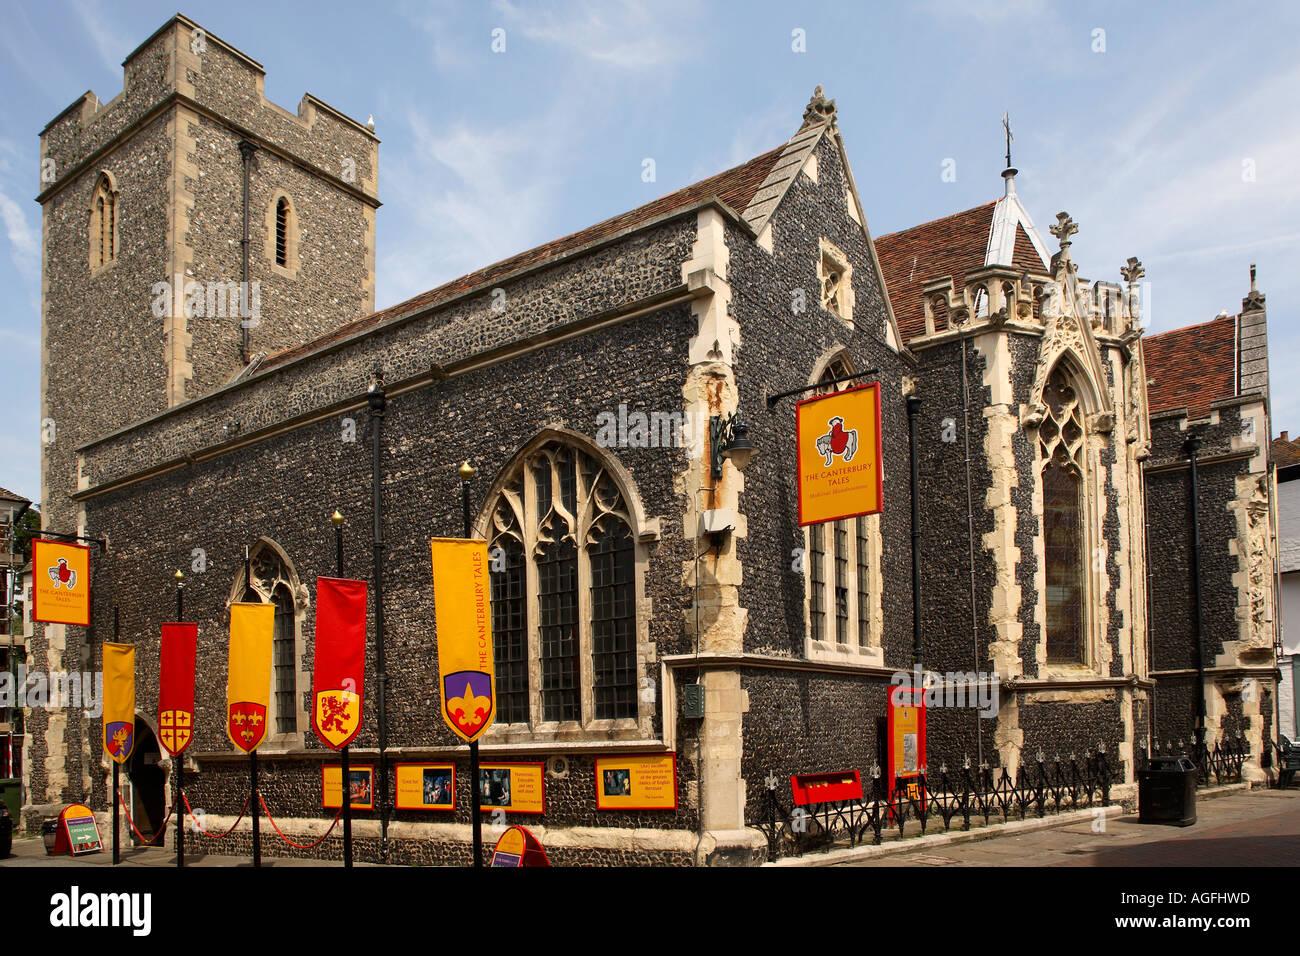 England. Canterbury. 'Canterbury tales' exhibition in church - Stock Image